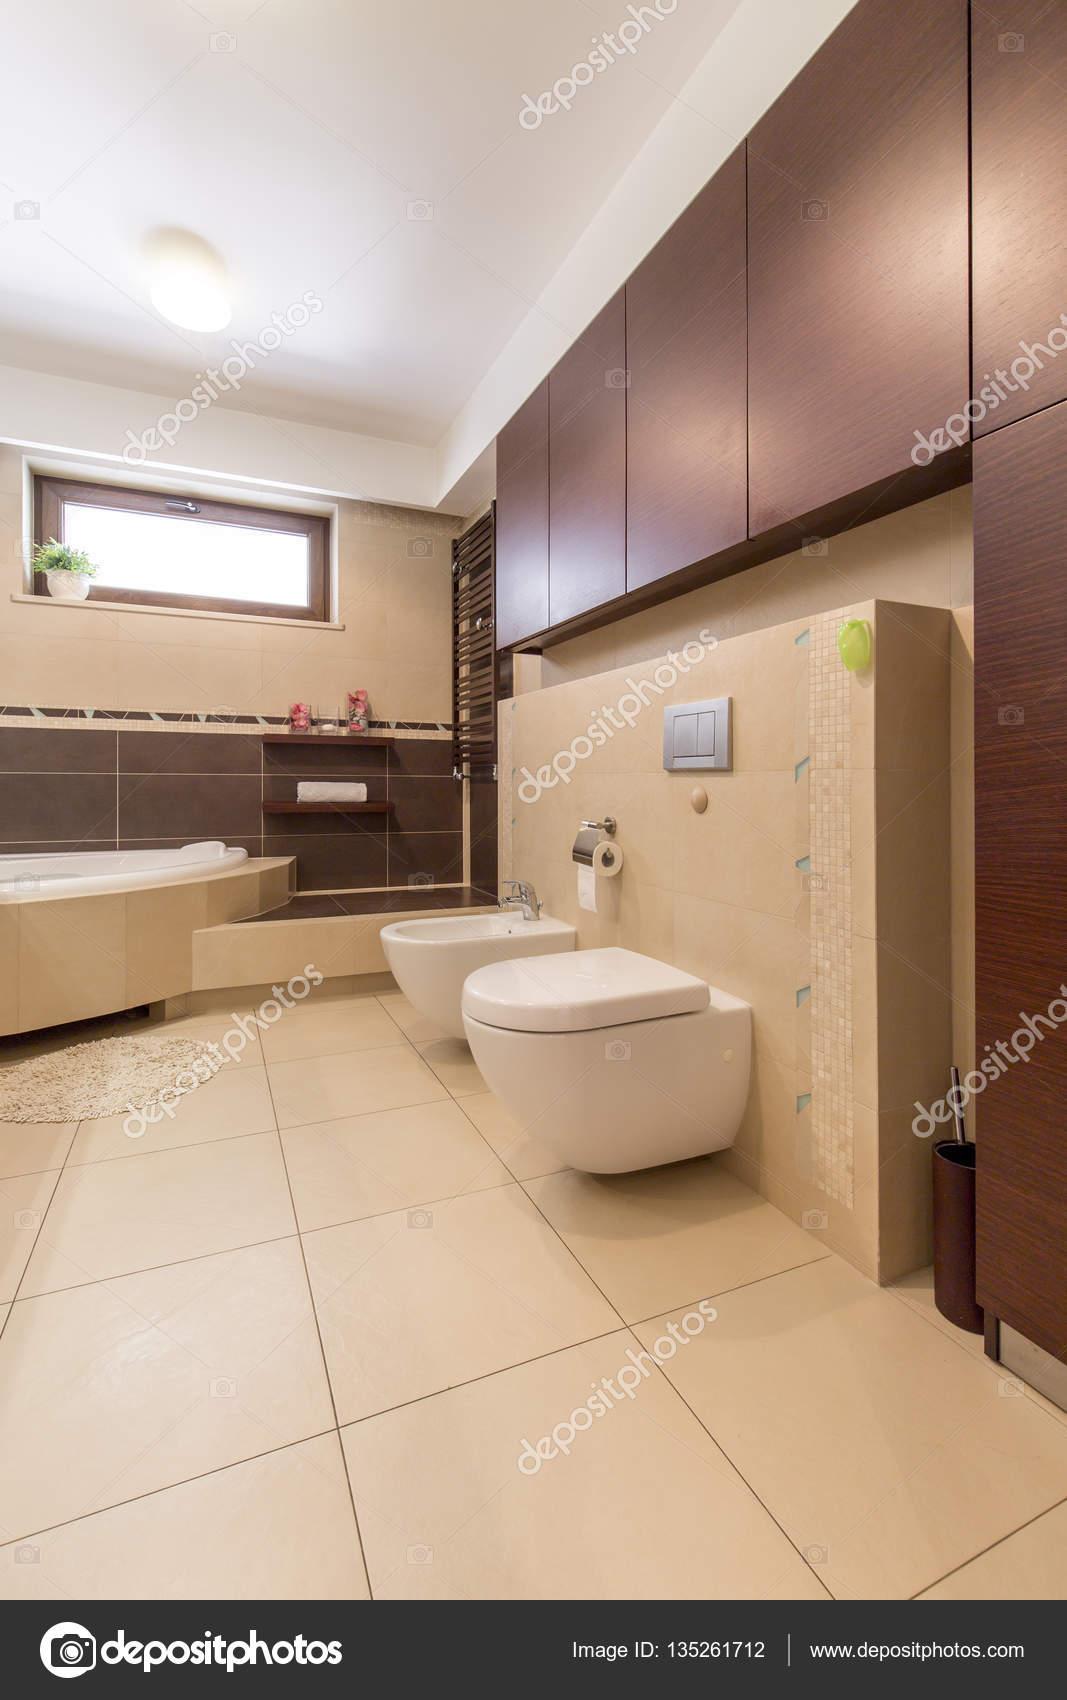 Piastrelle beige cucina moderna - Piastrelle bagno beige ...